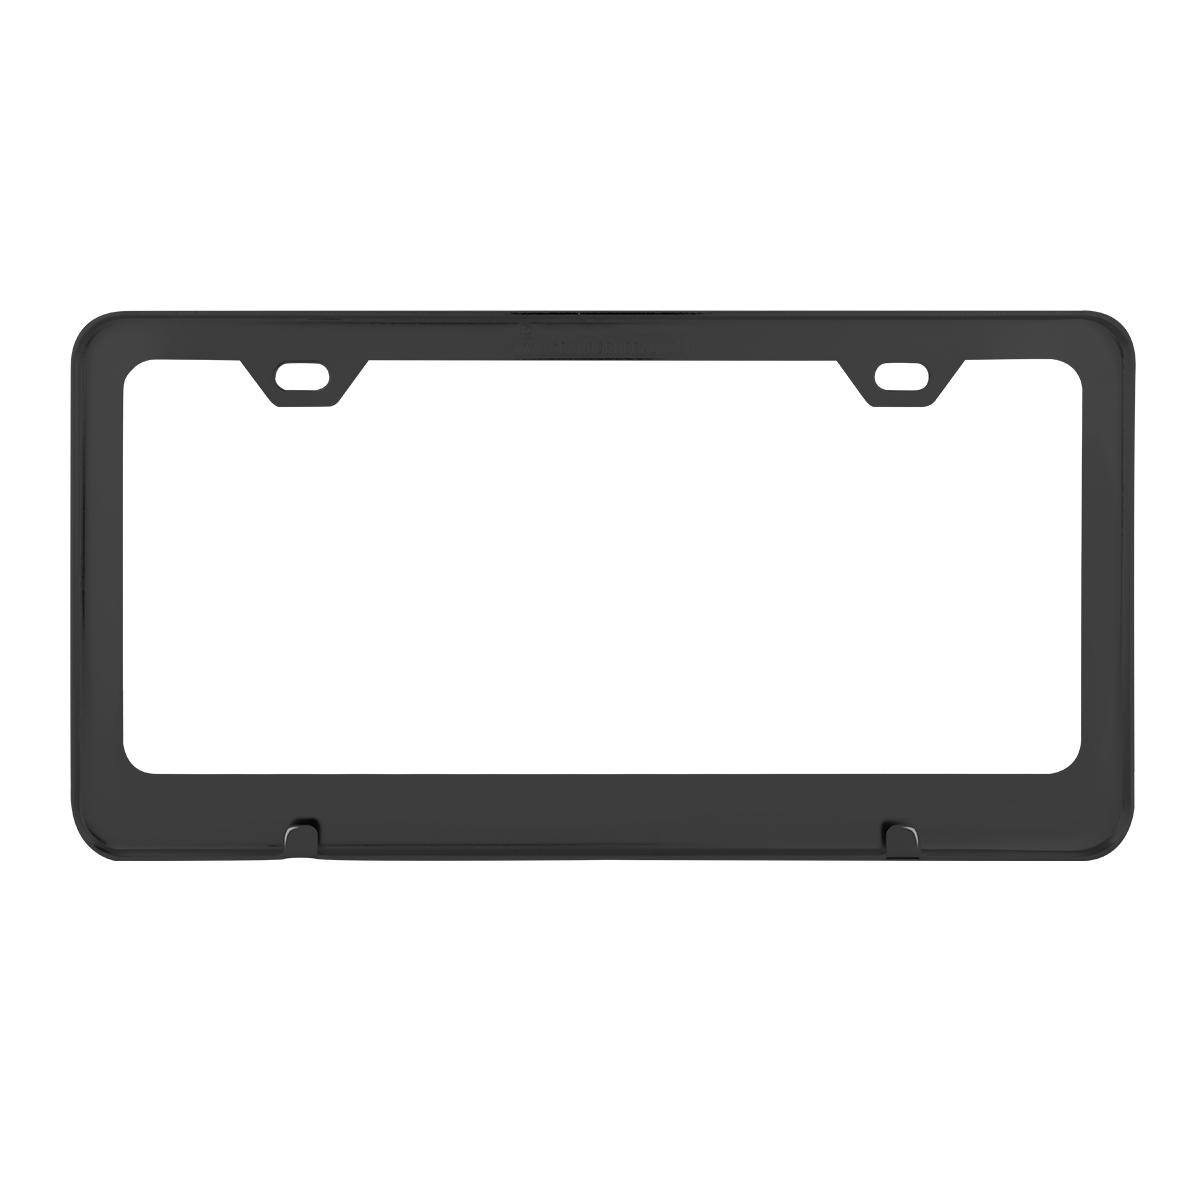 60439 Flat/Matte Plain Black 2 Hole License Plate Frame - Black View